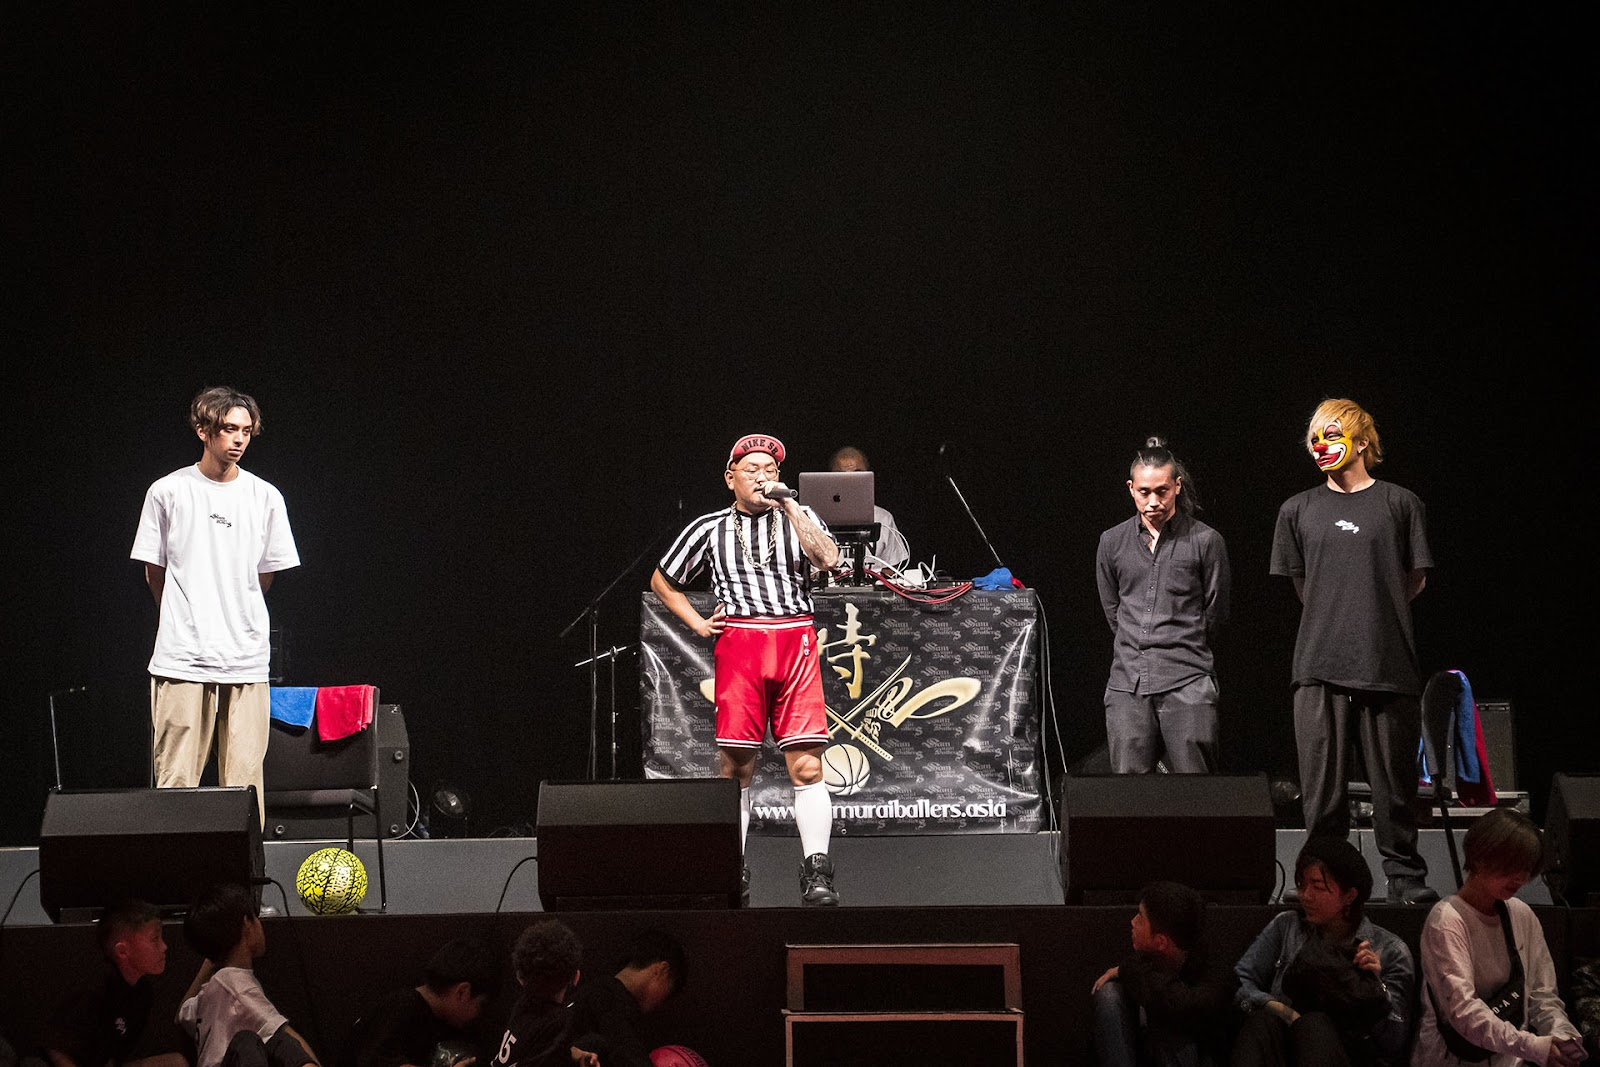 FKO -SAMURAI BALLERS 15th Anniversary-レポート | FLY BASKETBALL CULTURE  MAGAZINE | バスケットボール ファッション・カルチャー マガジン